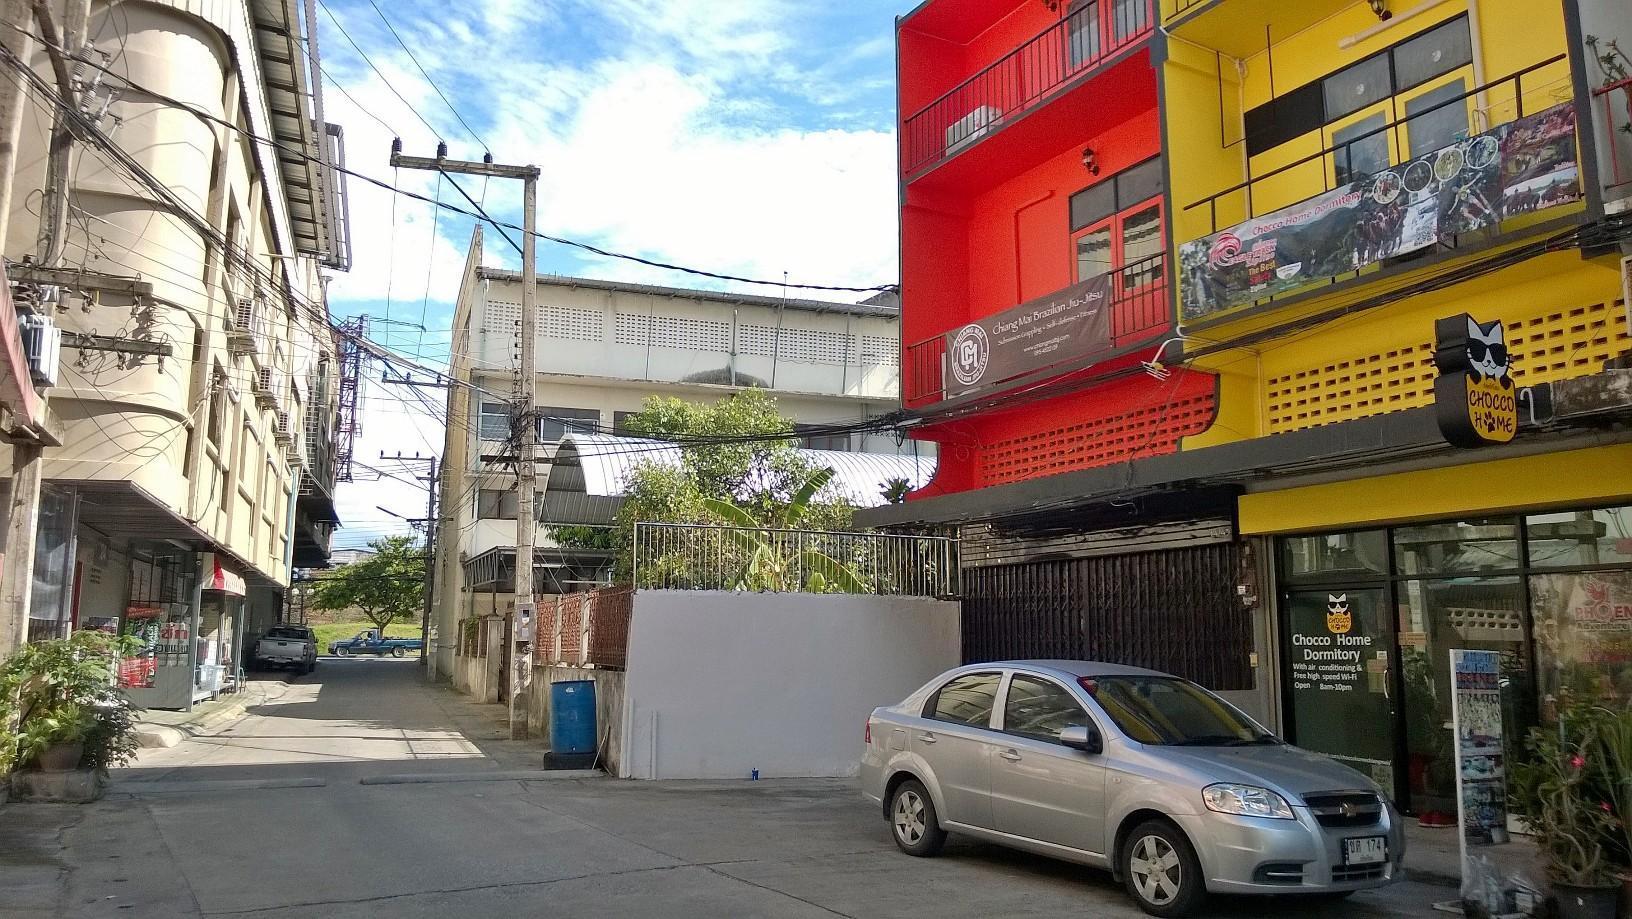 chocco home chiangmai old city in chiang mai room deals photos rh agoda com